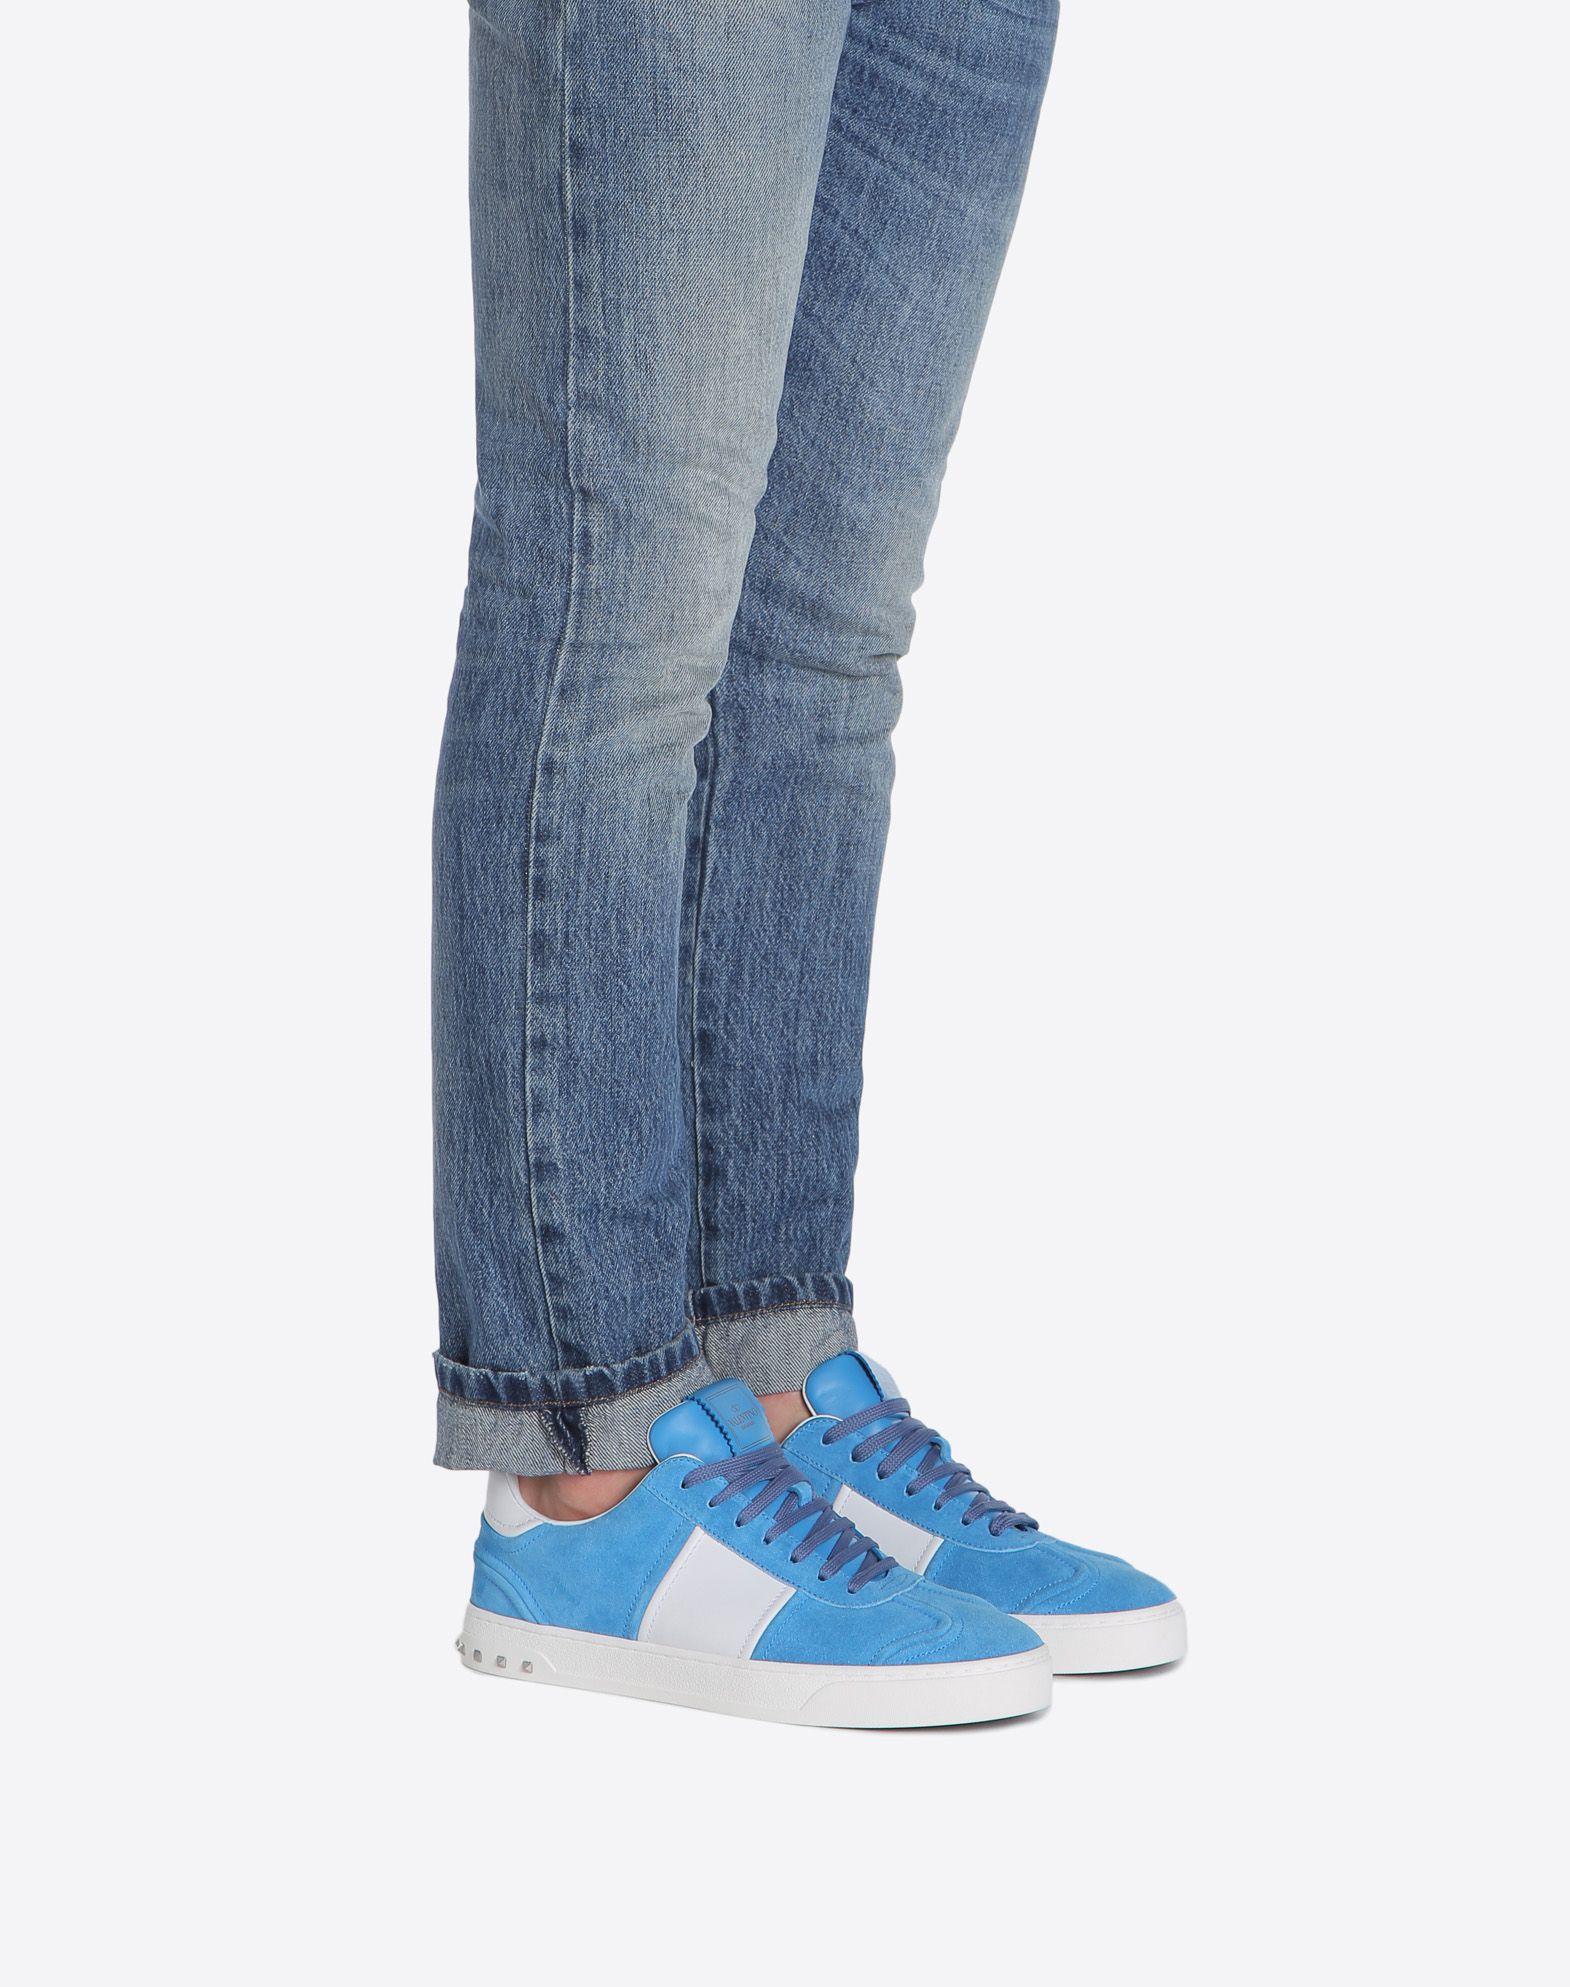 VALENTINO GARAVANI UOMO Flycrew 运动鞋 LOW-TOP SNEAKERS U a